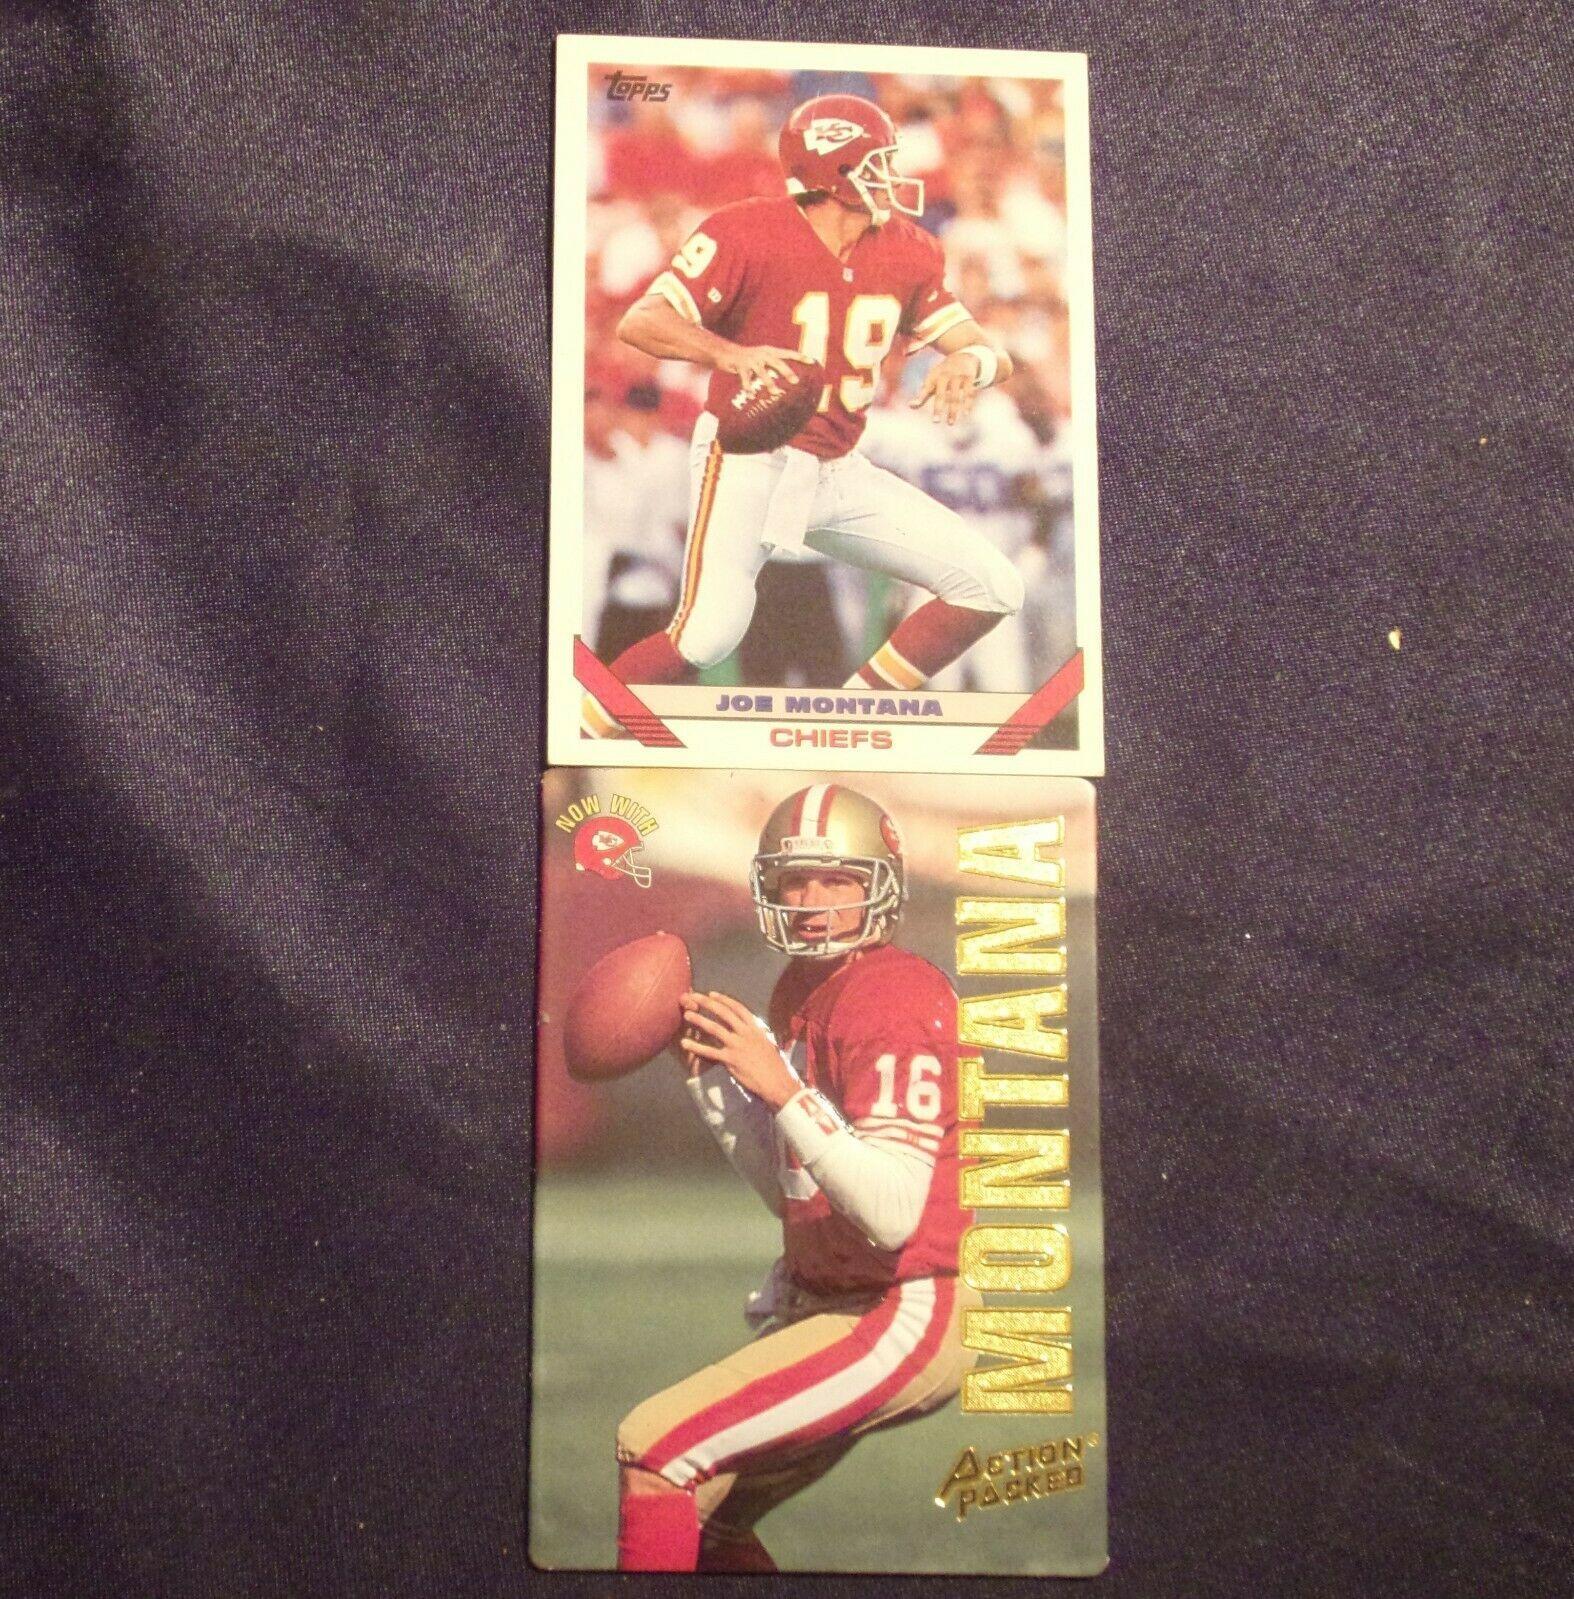 Joe Montana - QB Football Trading Cards AA-19FTC3010 Vintage